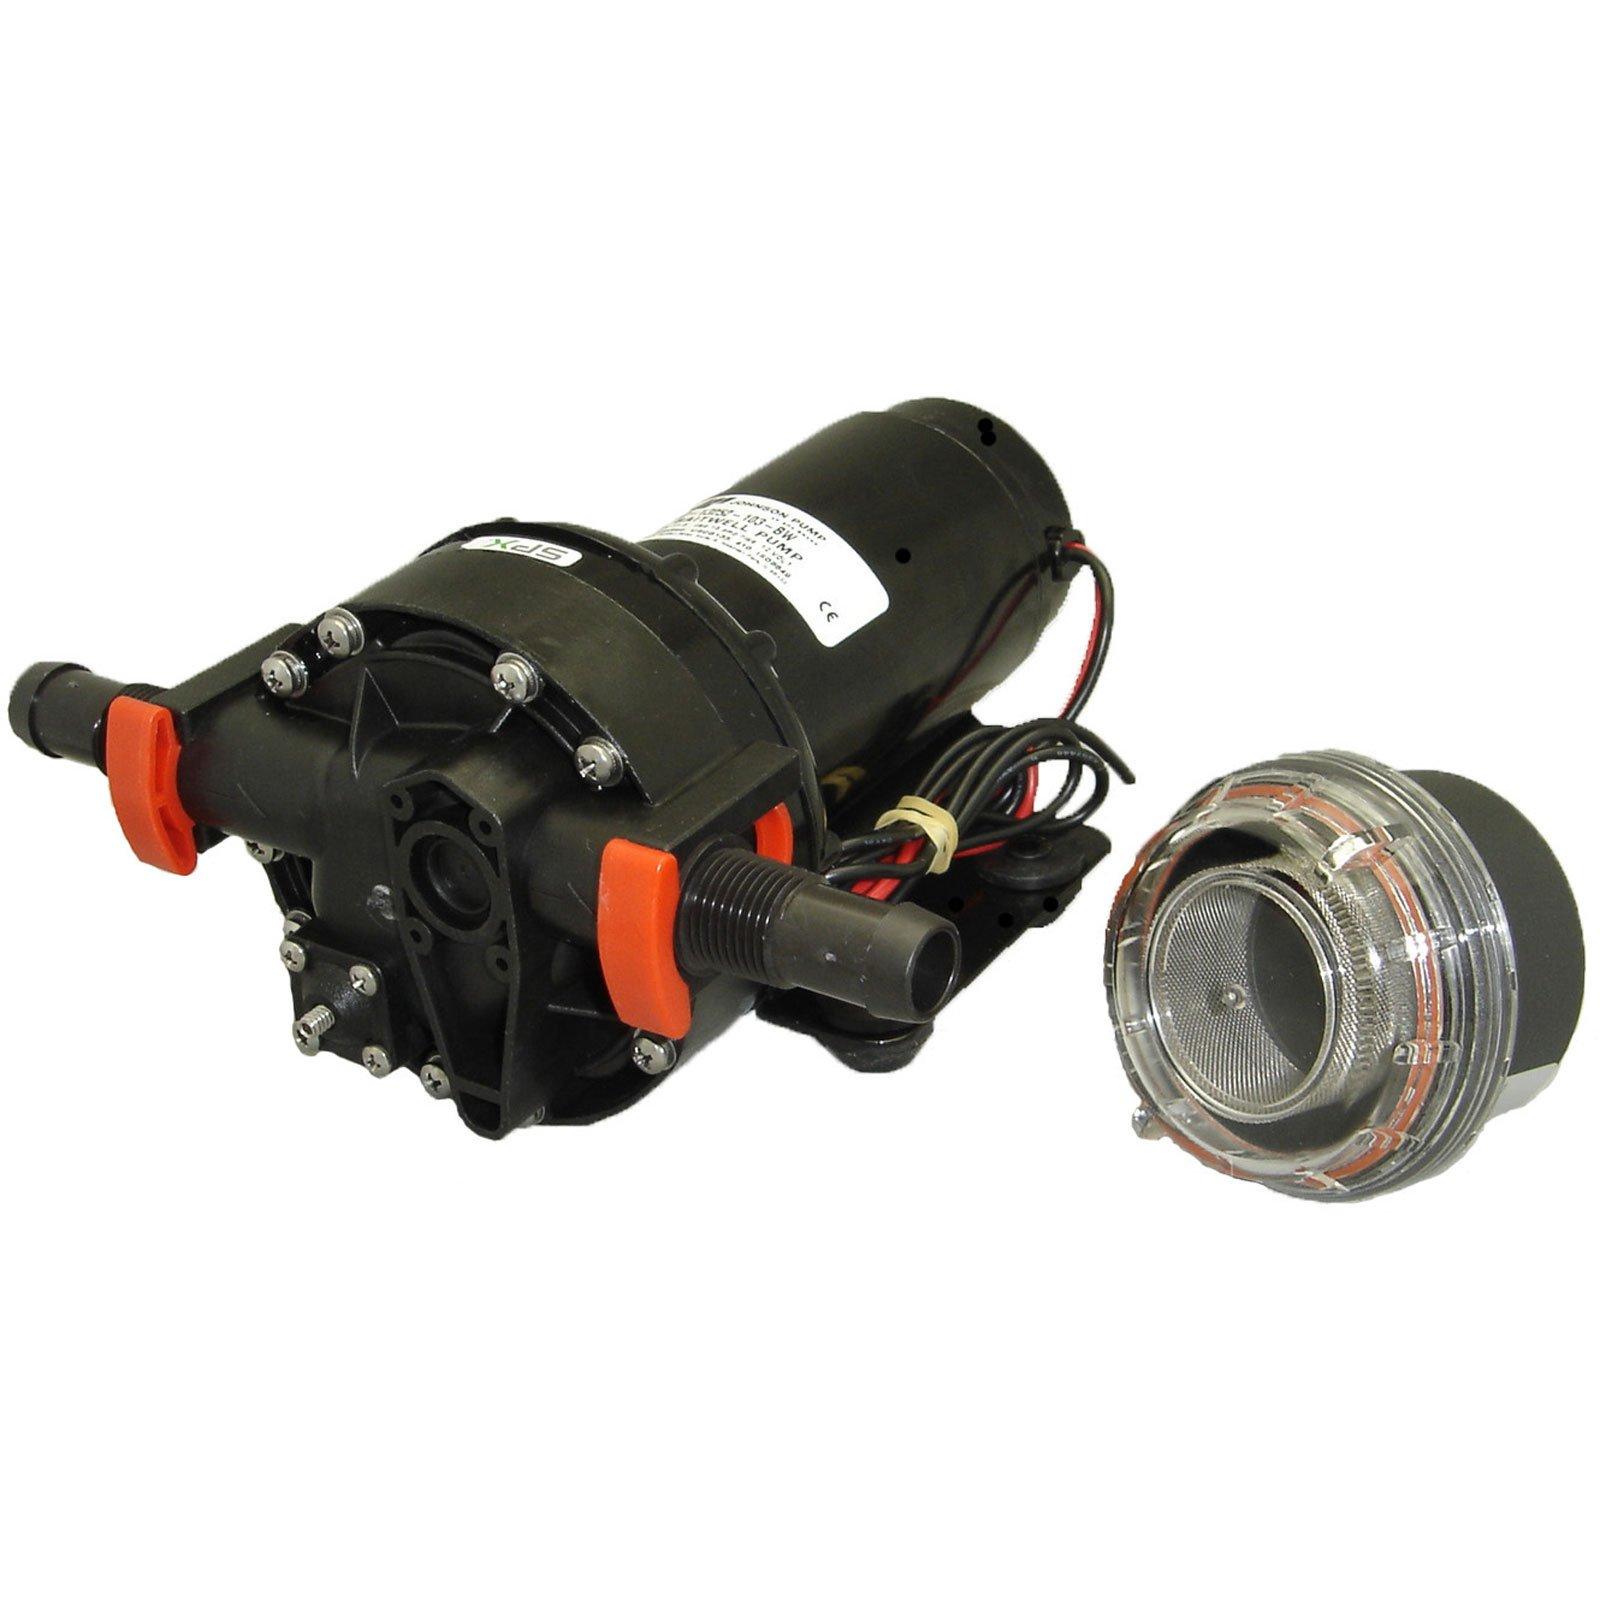 Johnson Pumps 10-13252-103-BW 4.0 GPM Baitwell Pump, 12V by Johnson Pumps